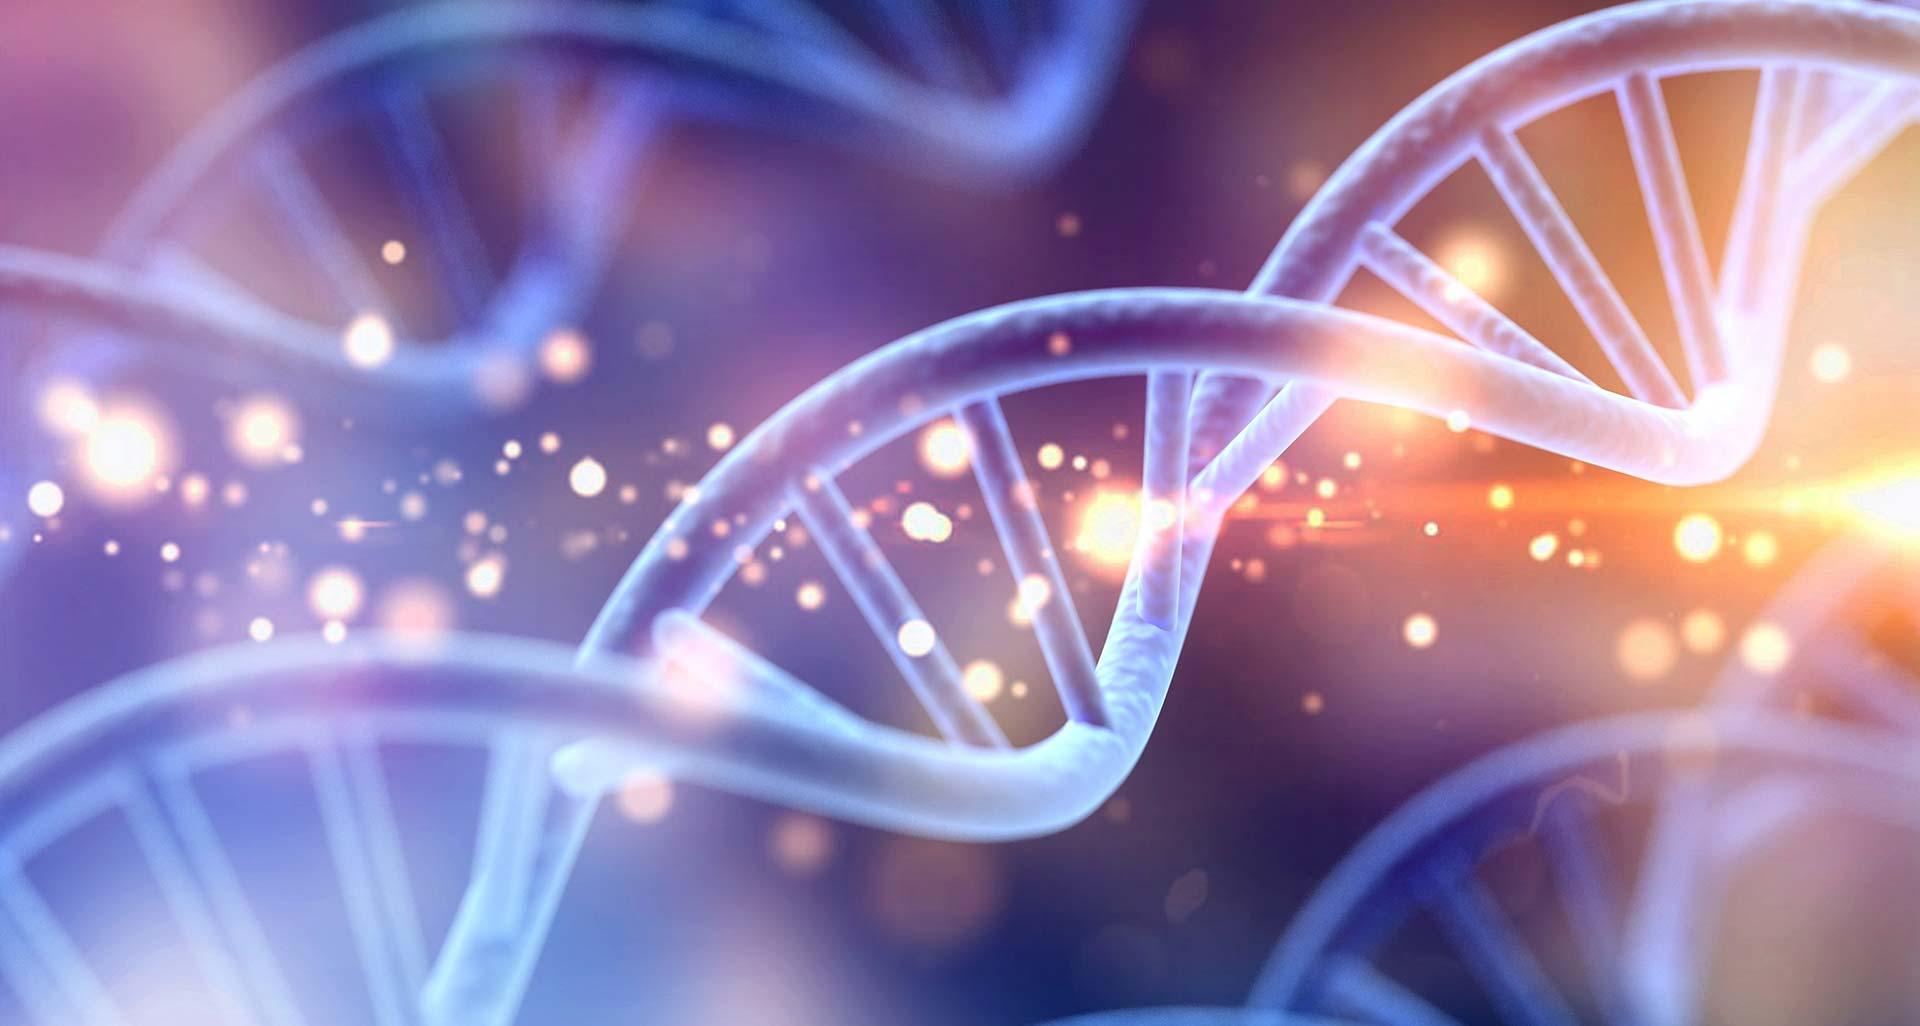 Synthetic Biology ศาสตร์ใหม่ที่จะเปลี่ยนโลก